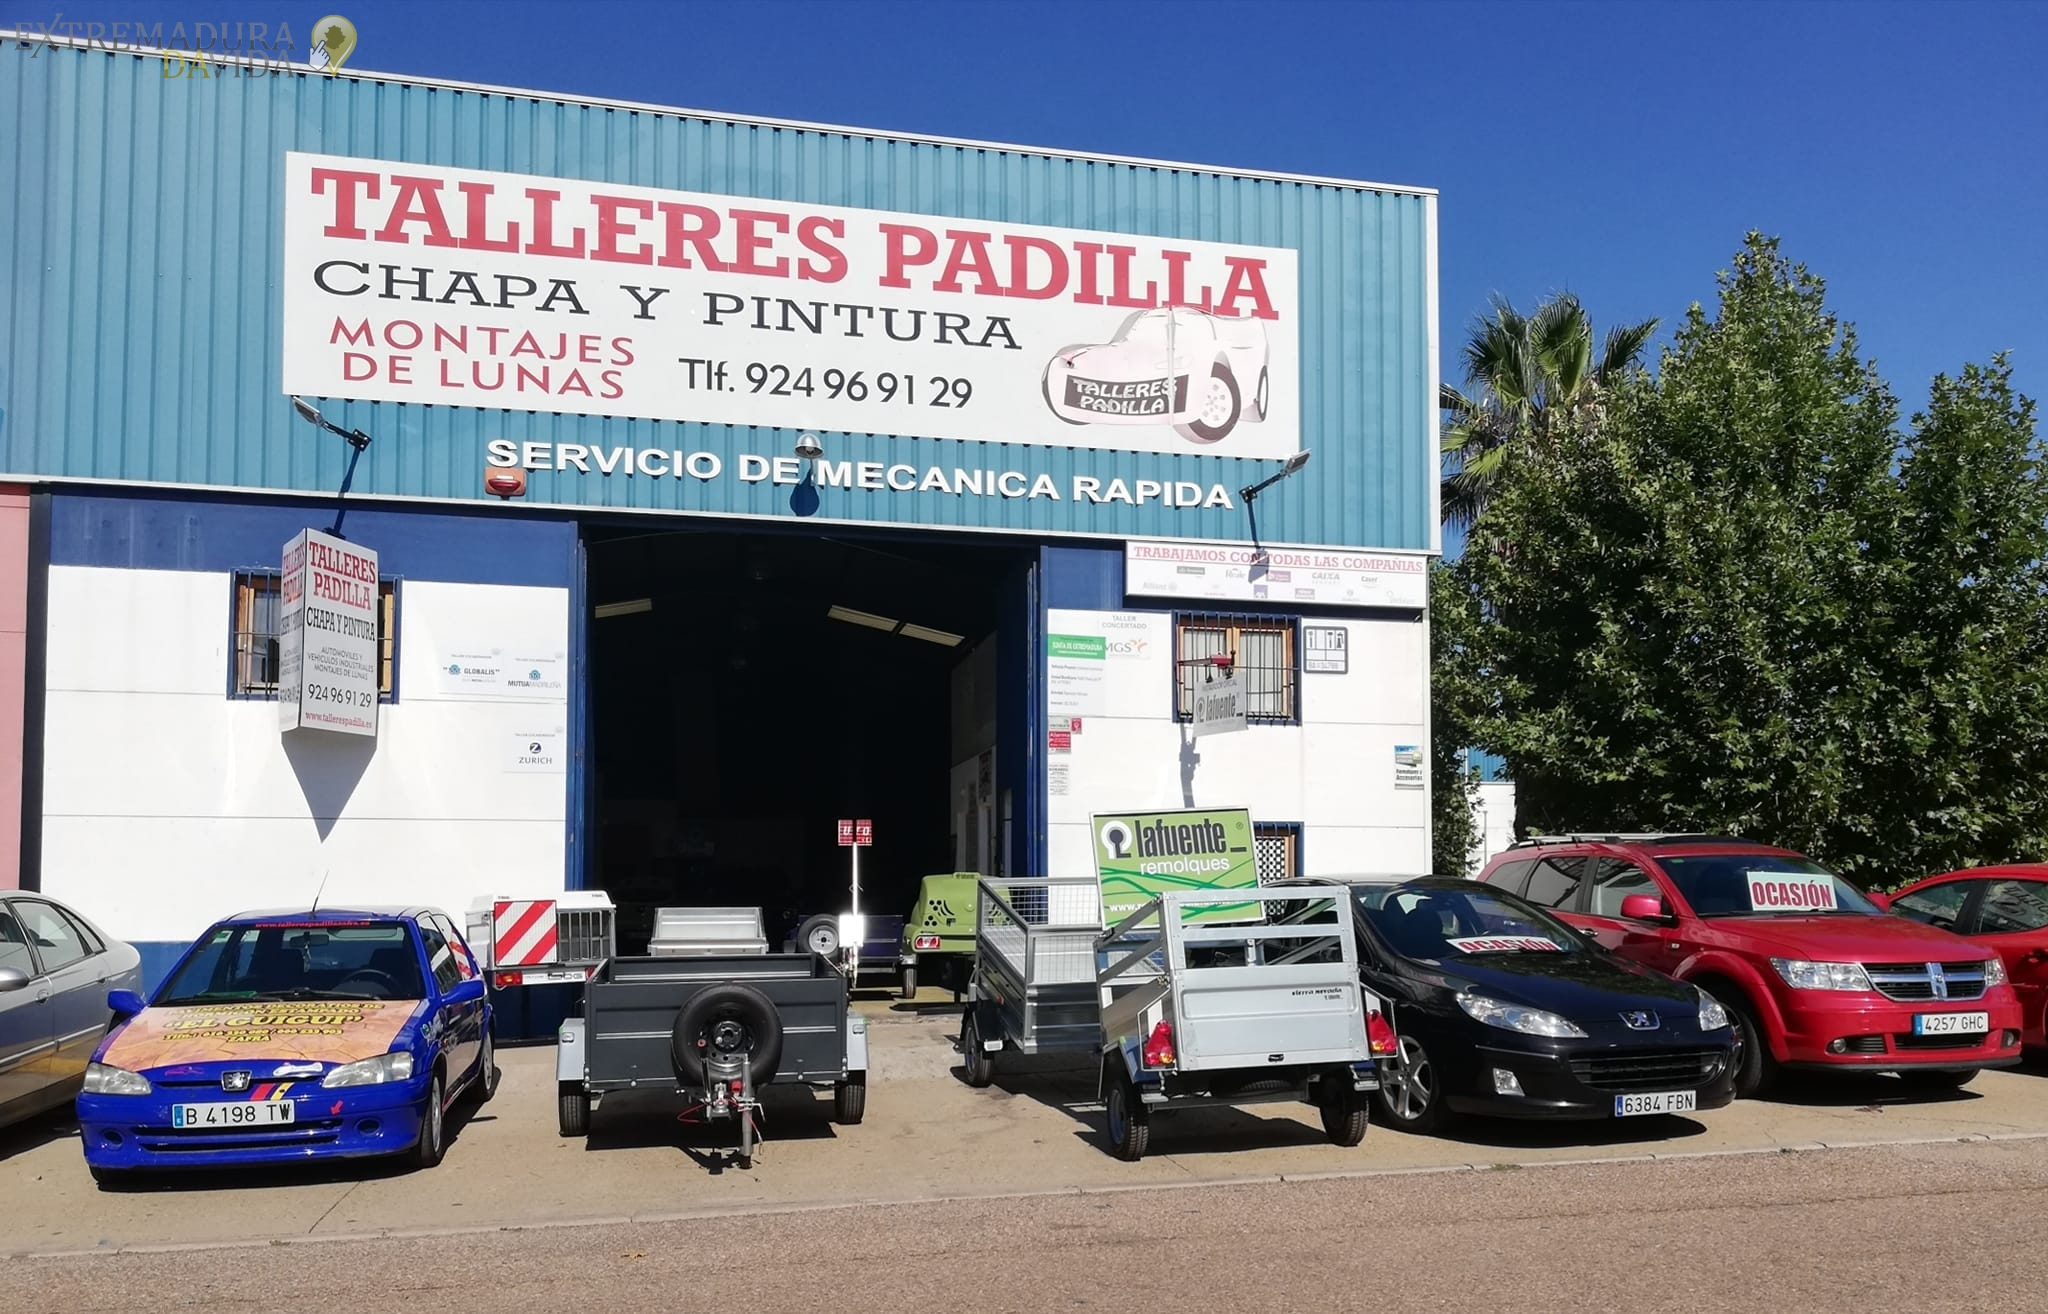 Taller chapa y pintura en Zafra Padilla Pintar coche